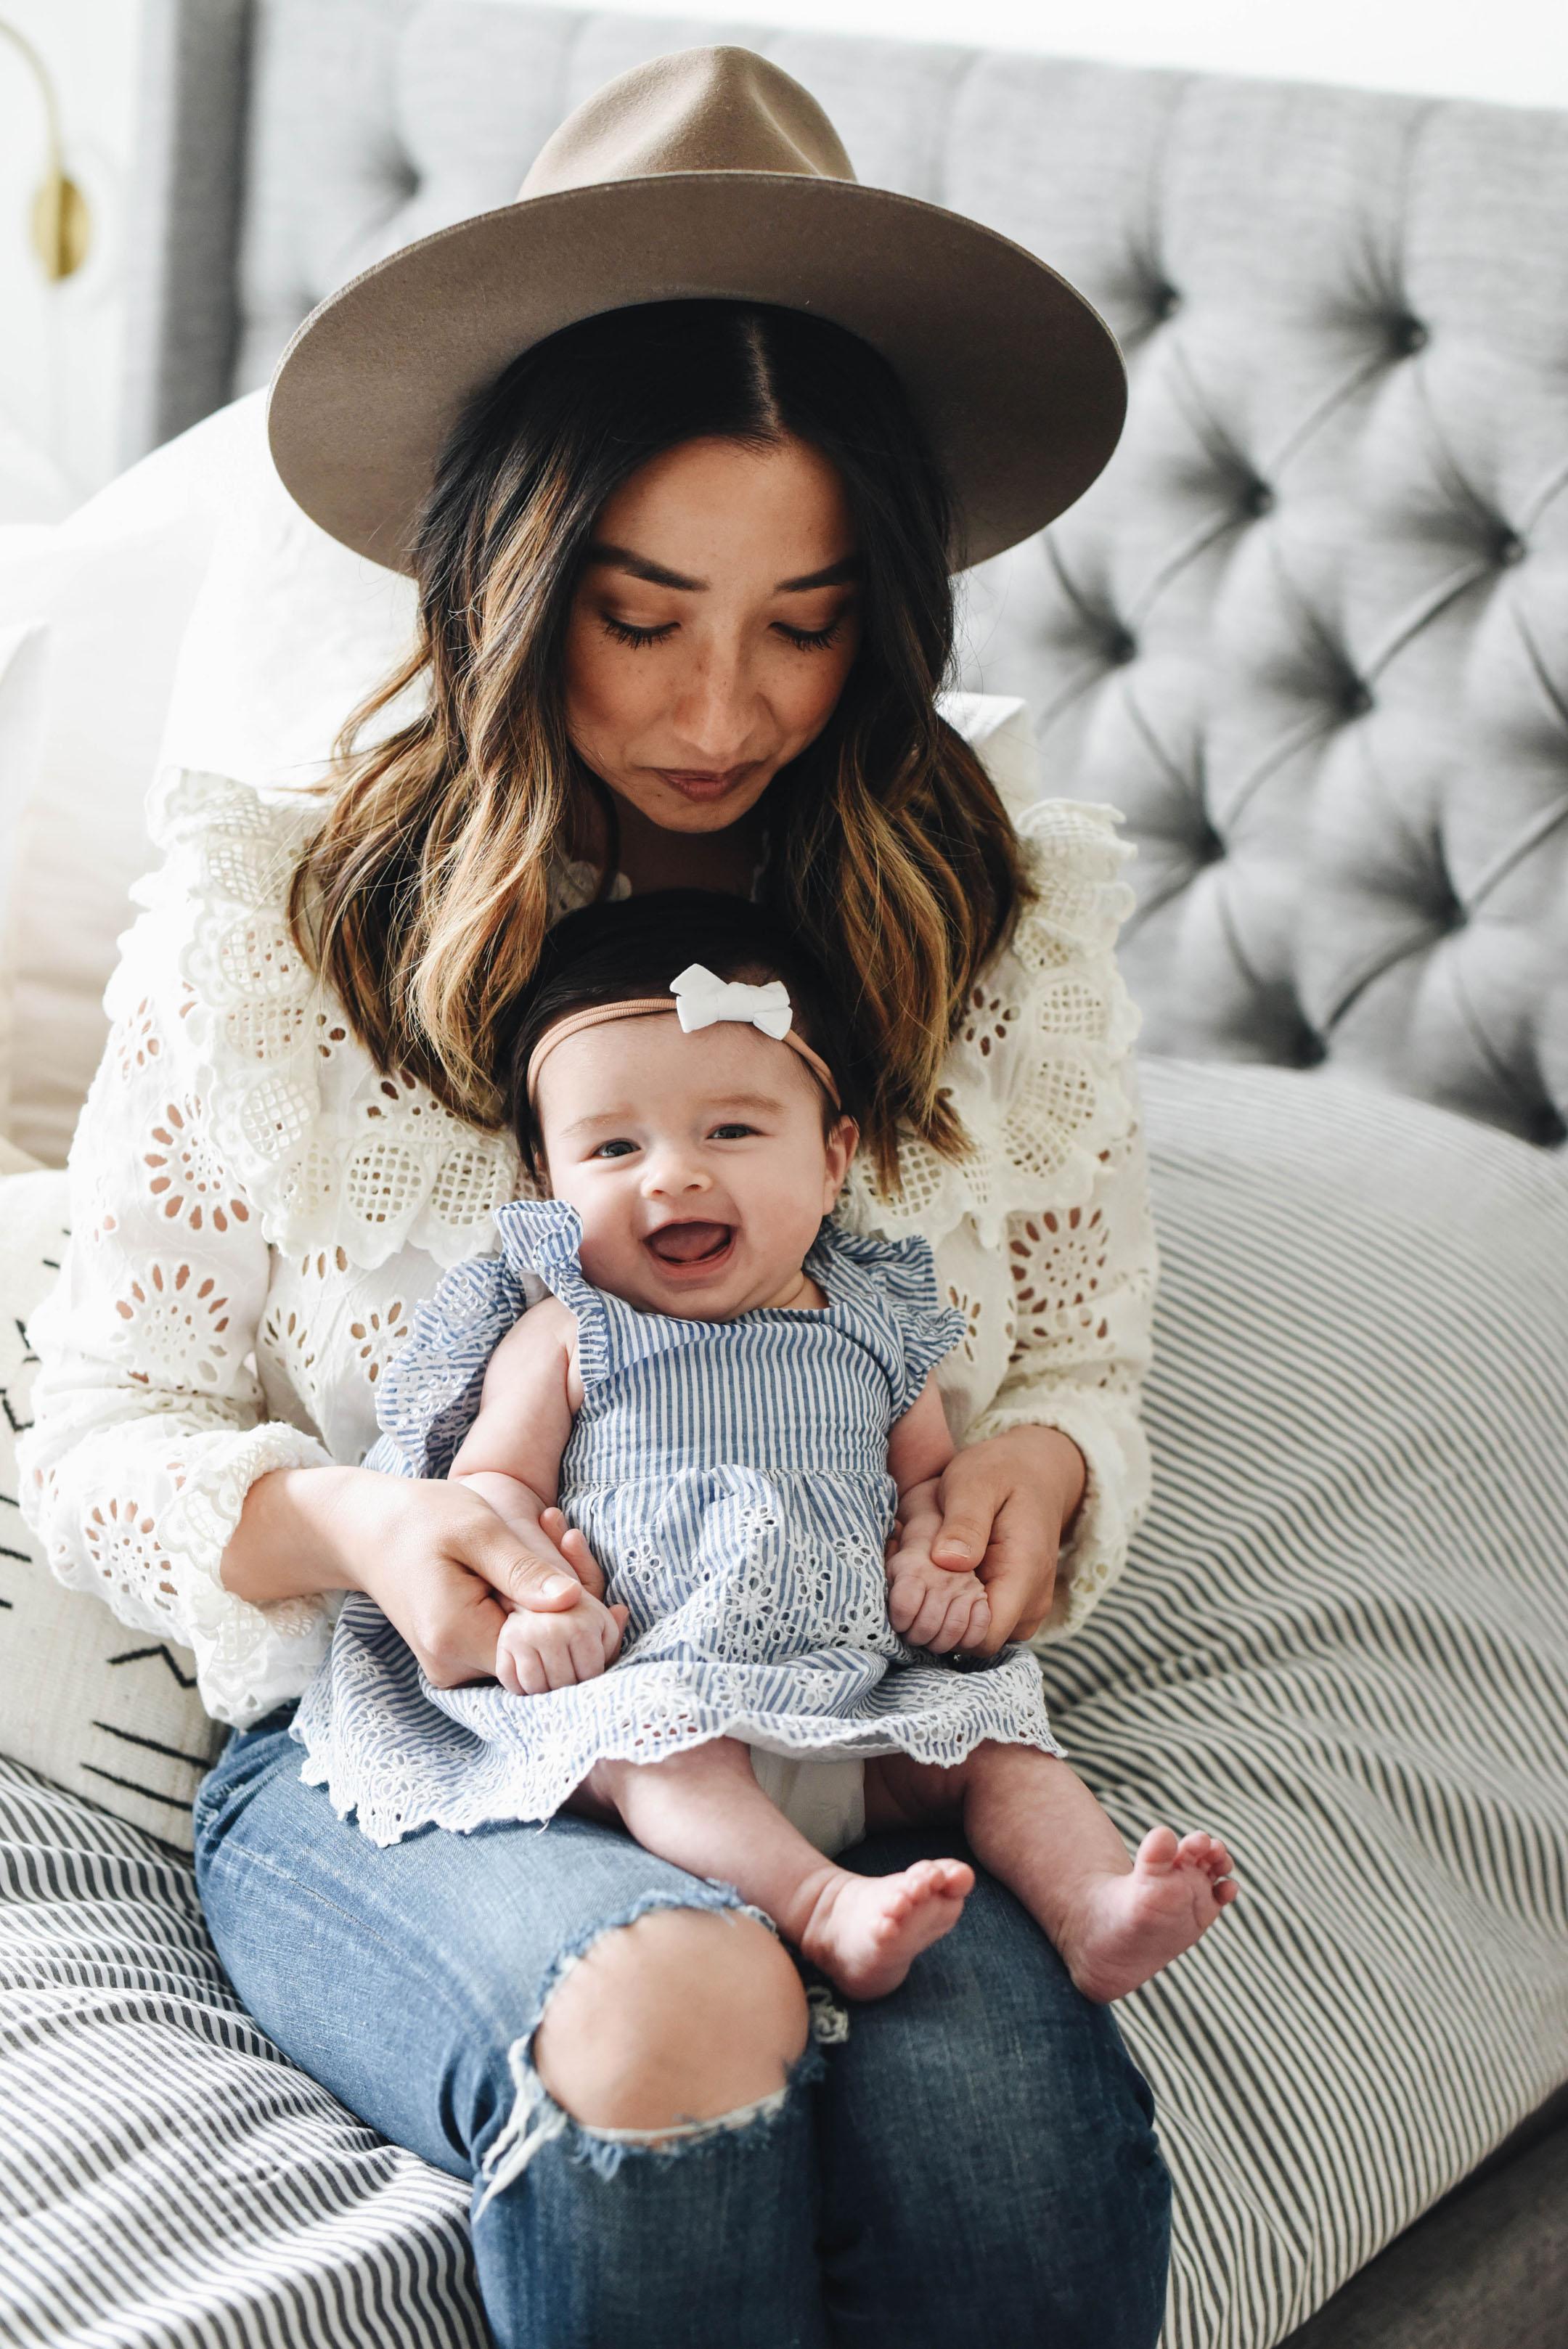 Crystalin marie's baby Harper